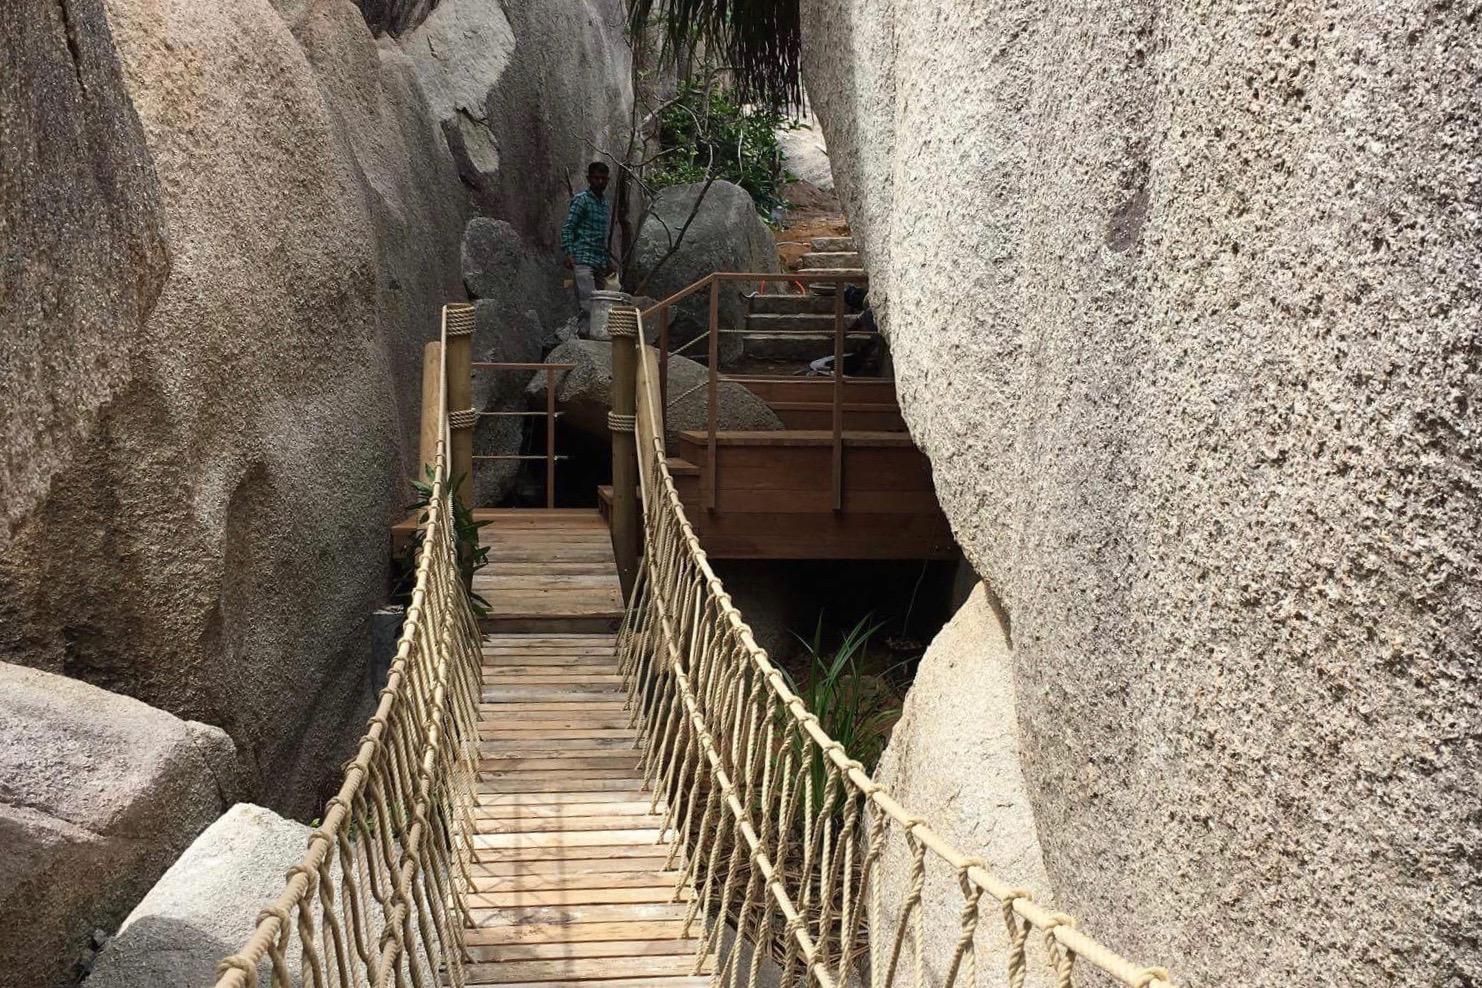 Rope Bridge deck and stairs